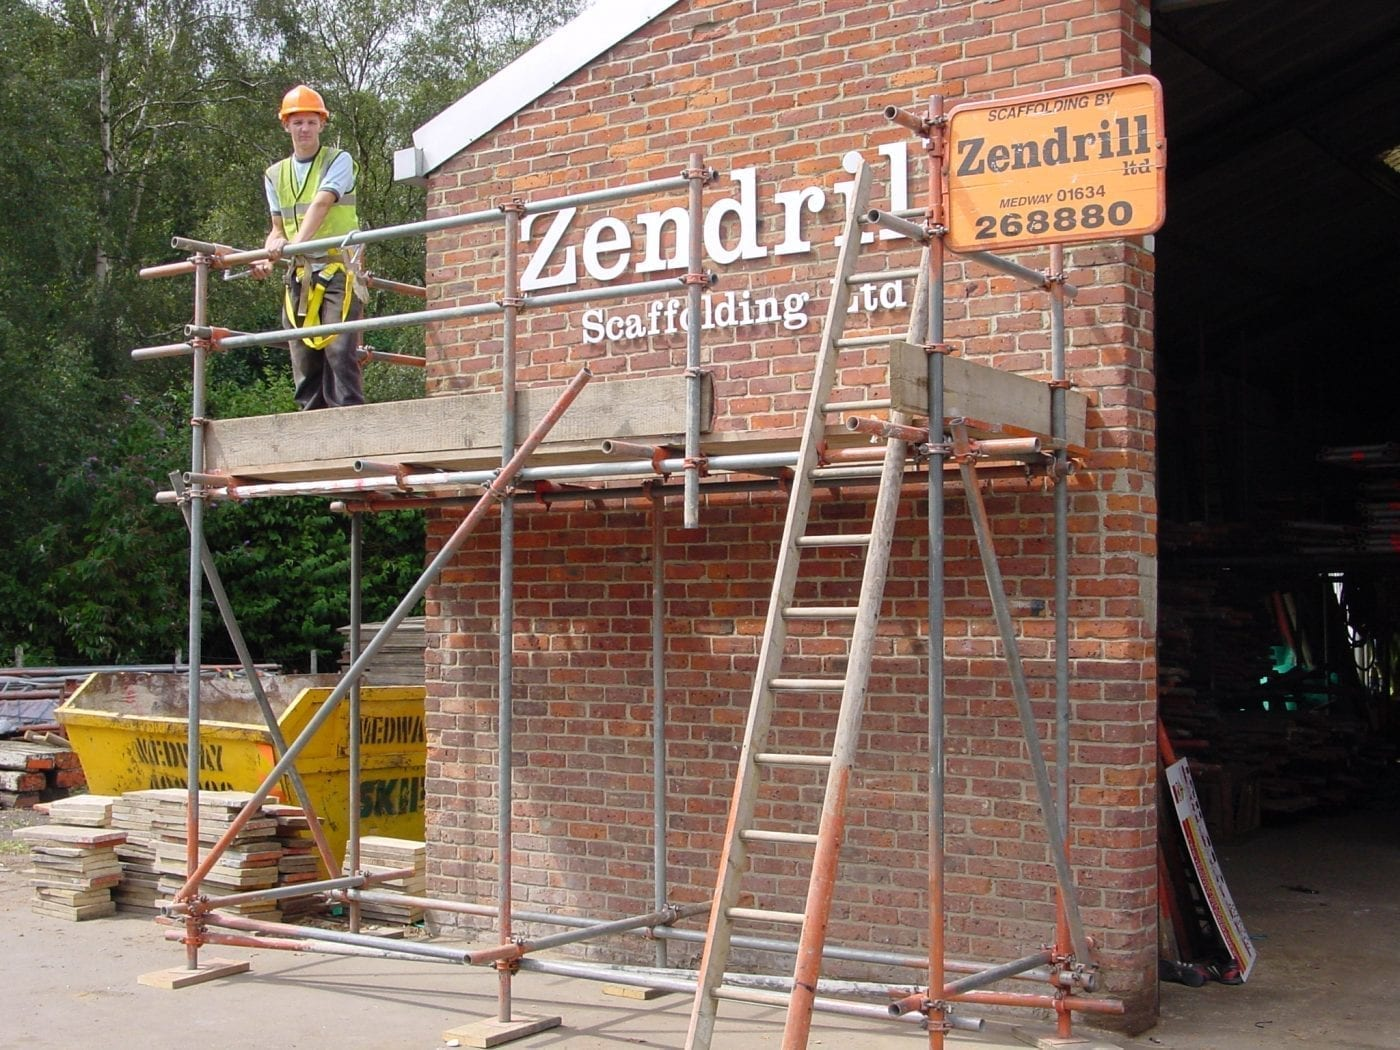 Zendrill Scaffolding